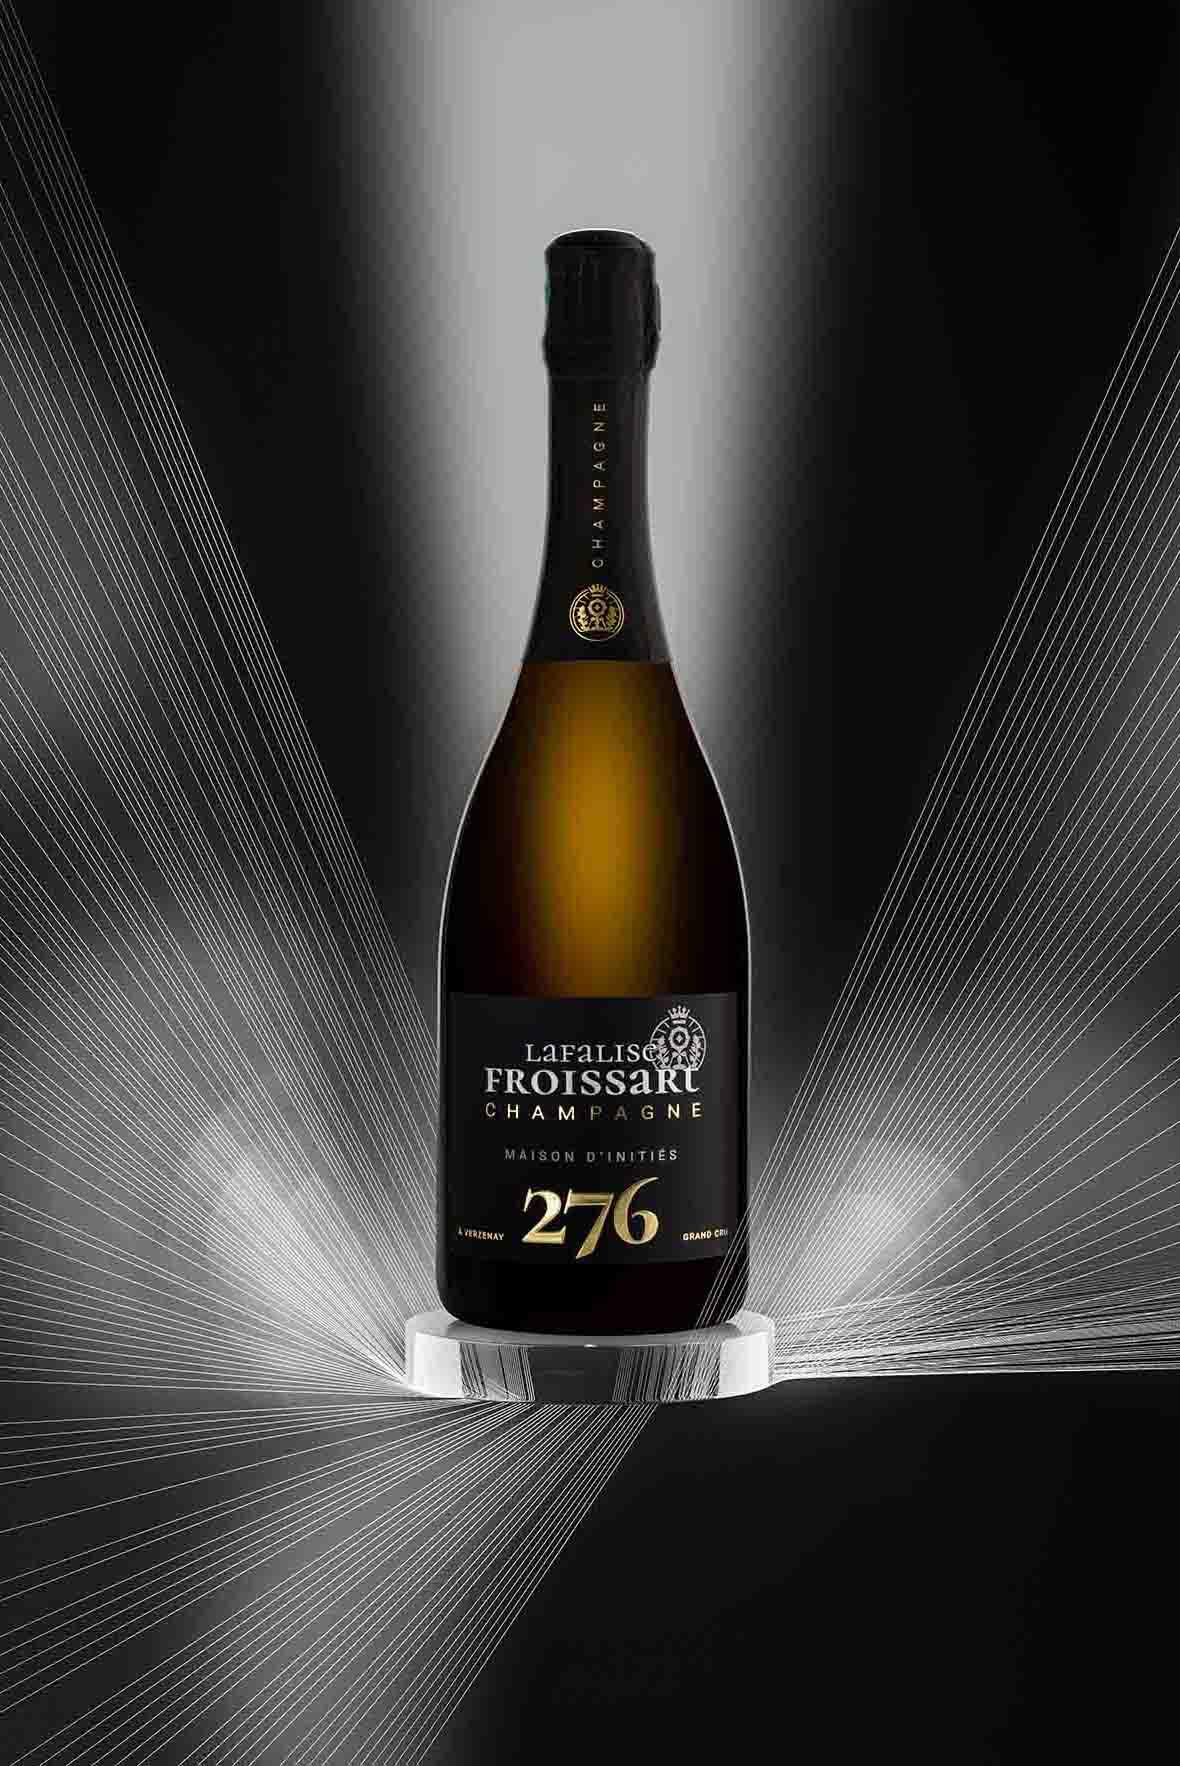 Packshots photo lifestyle 276 - Champagne Lafalise Froissart - Agence Discovery